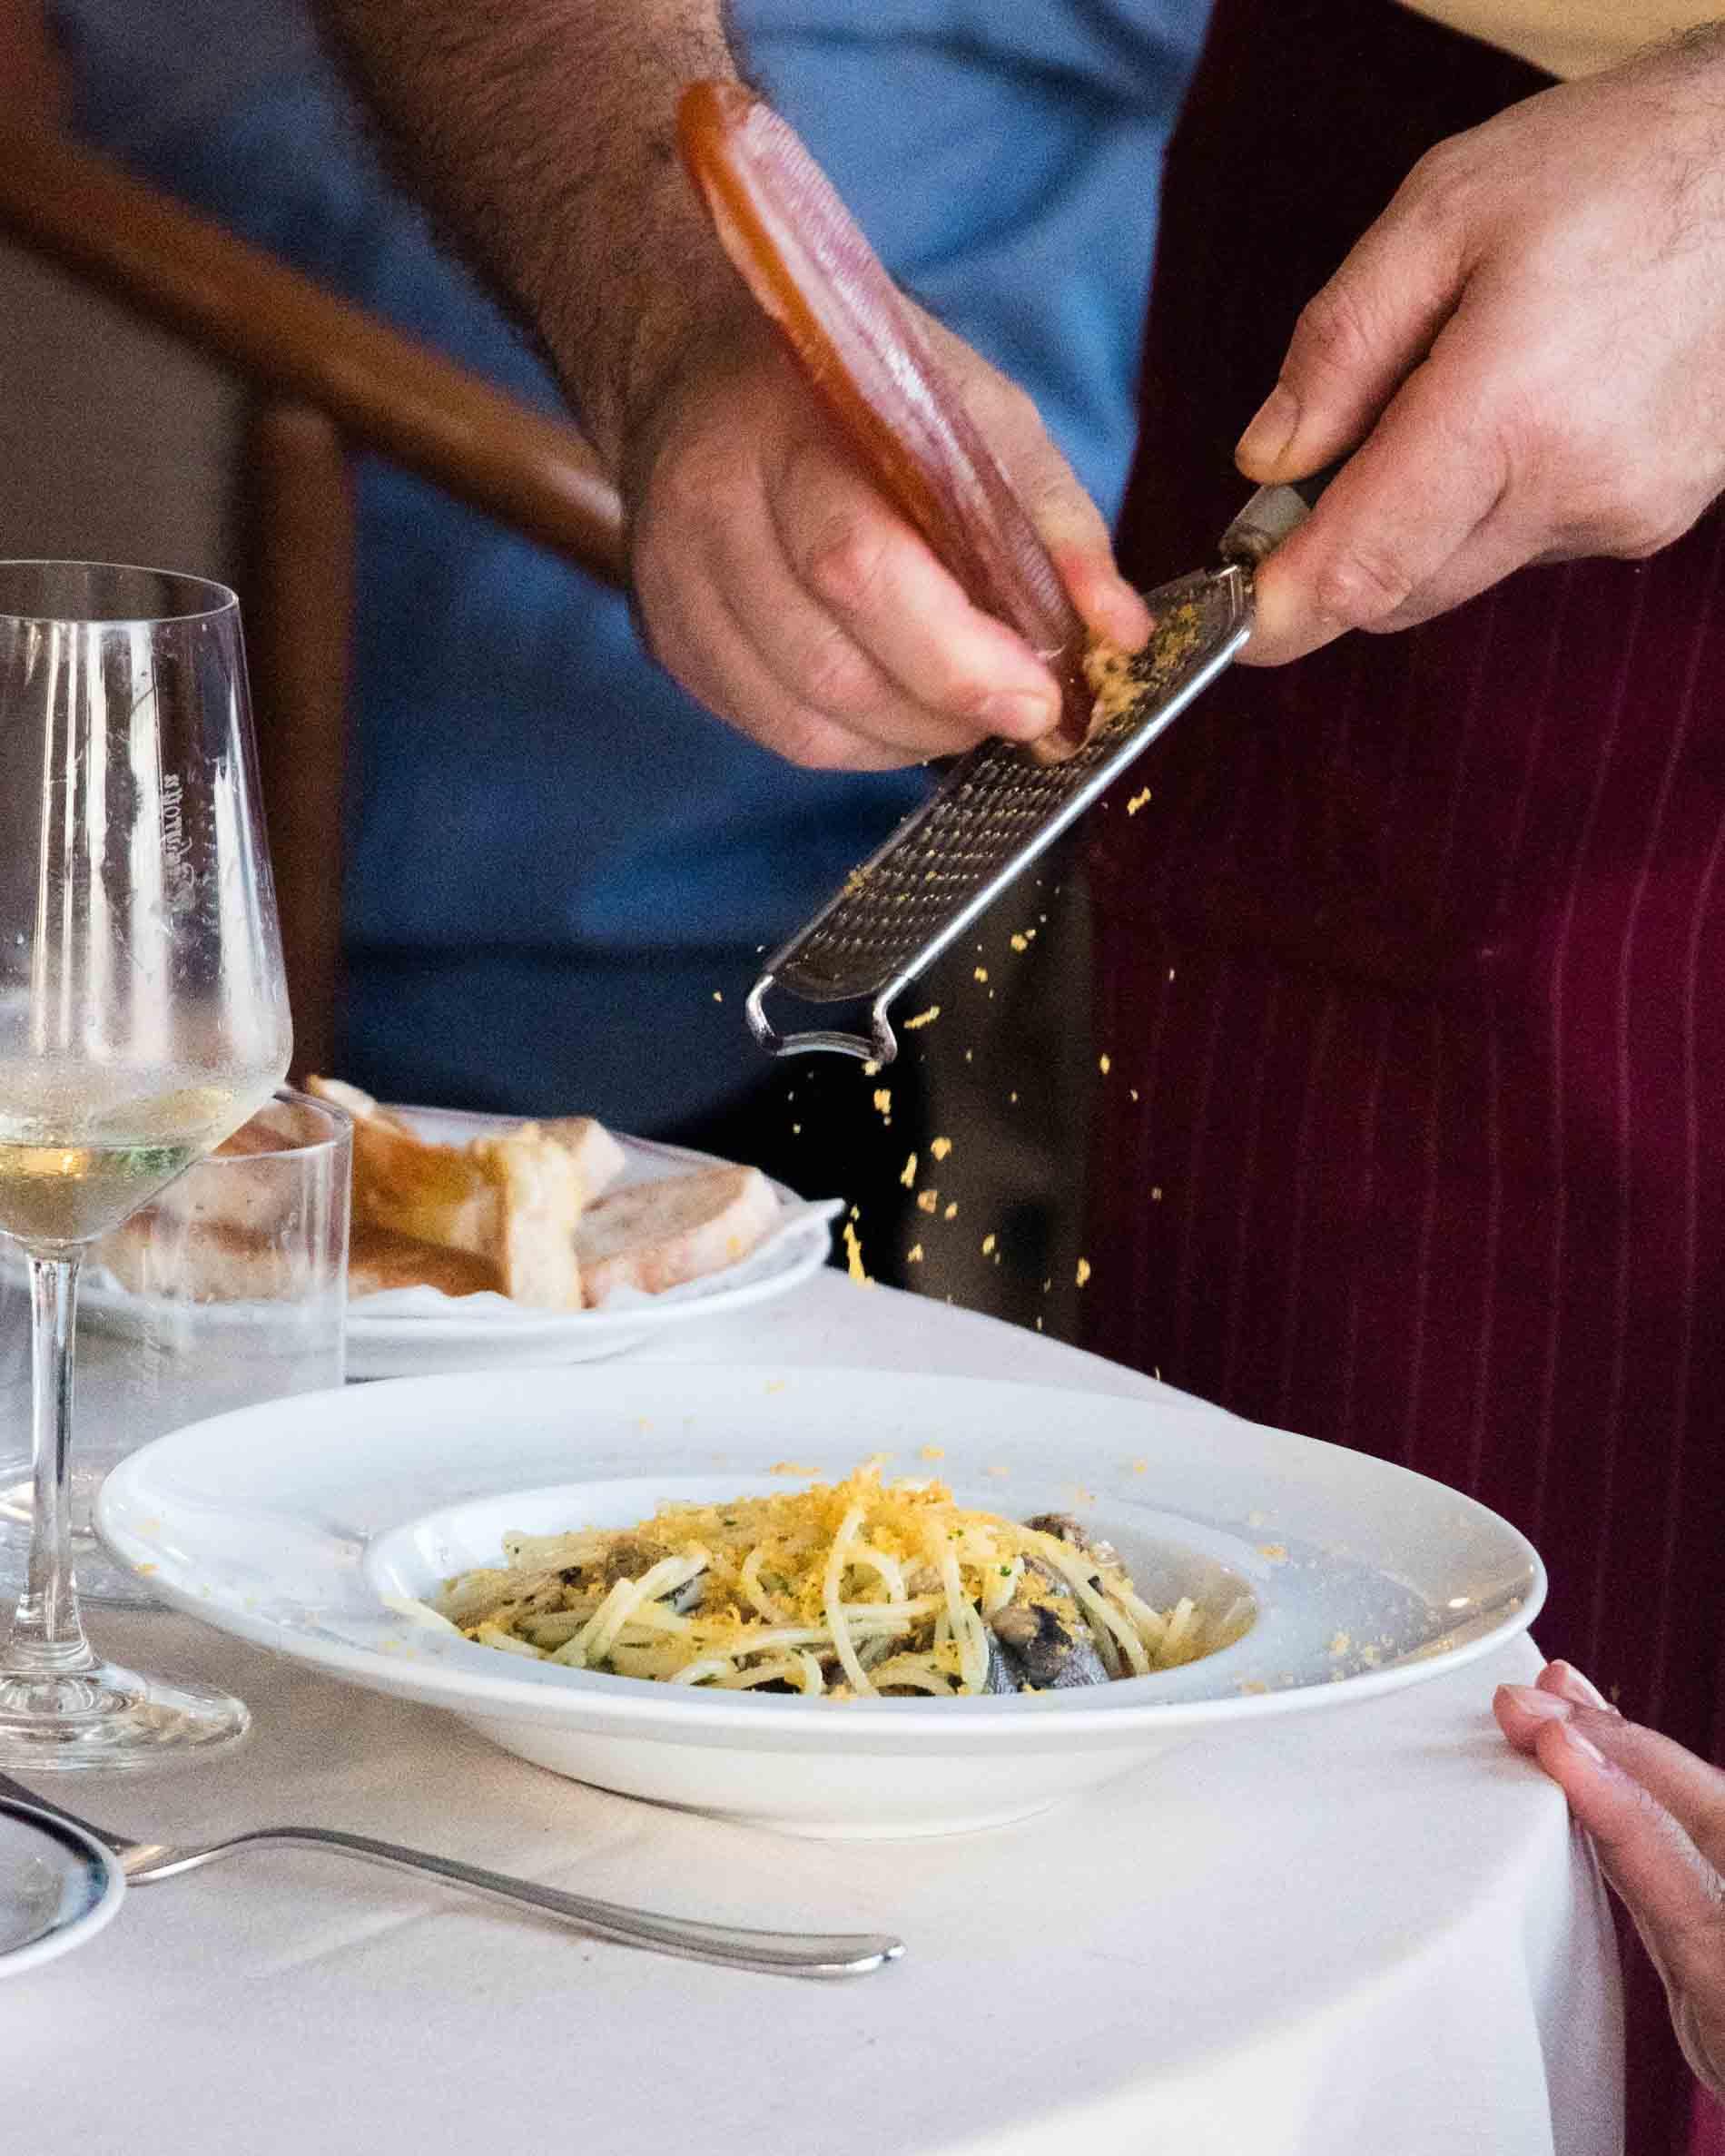 la-piedigrotta-ristorante-da-carmine-e-antonio-182